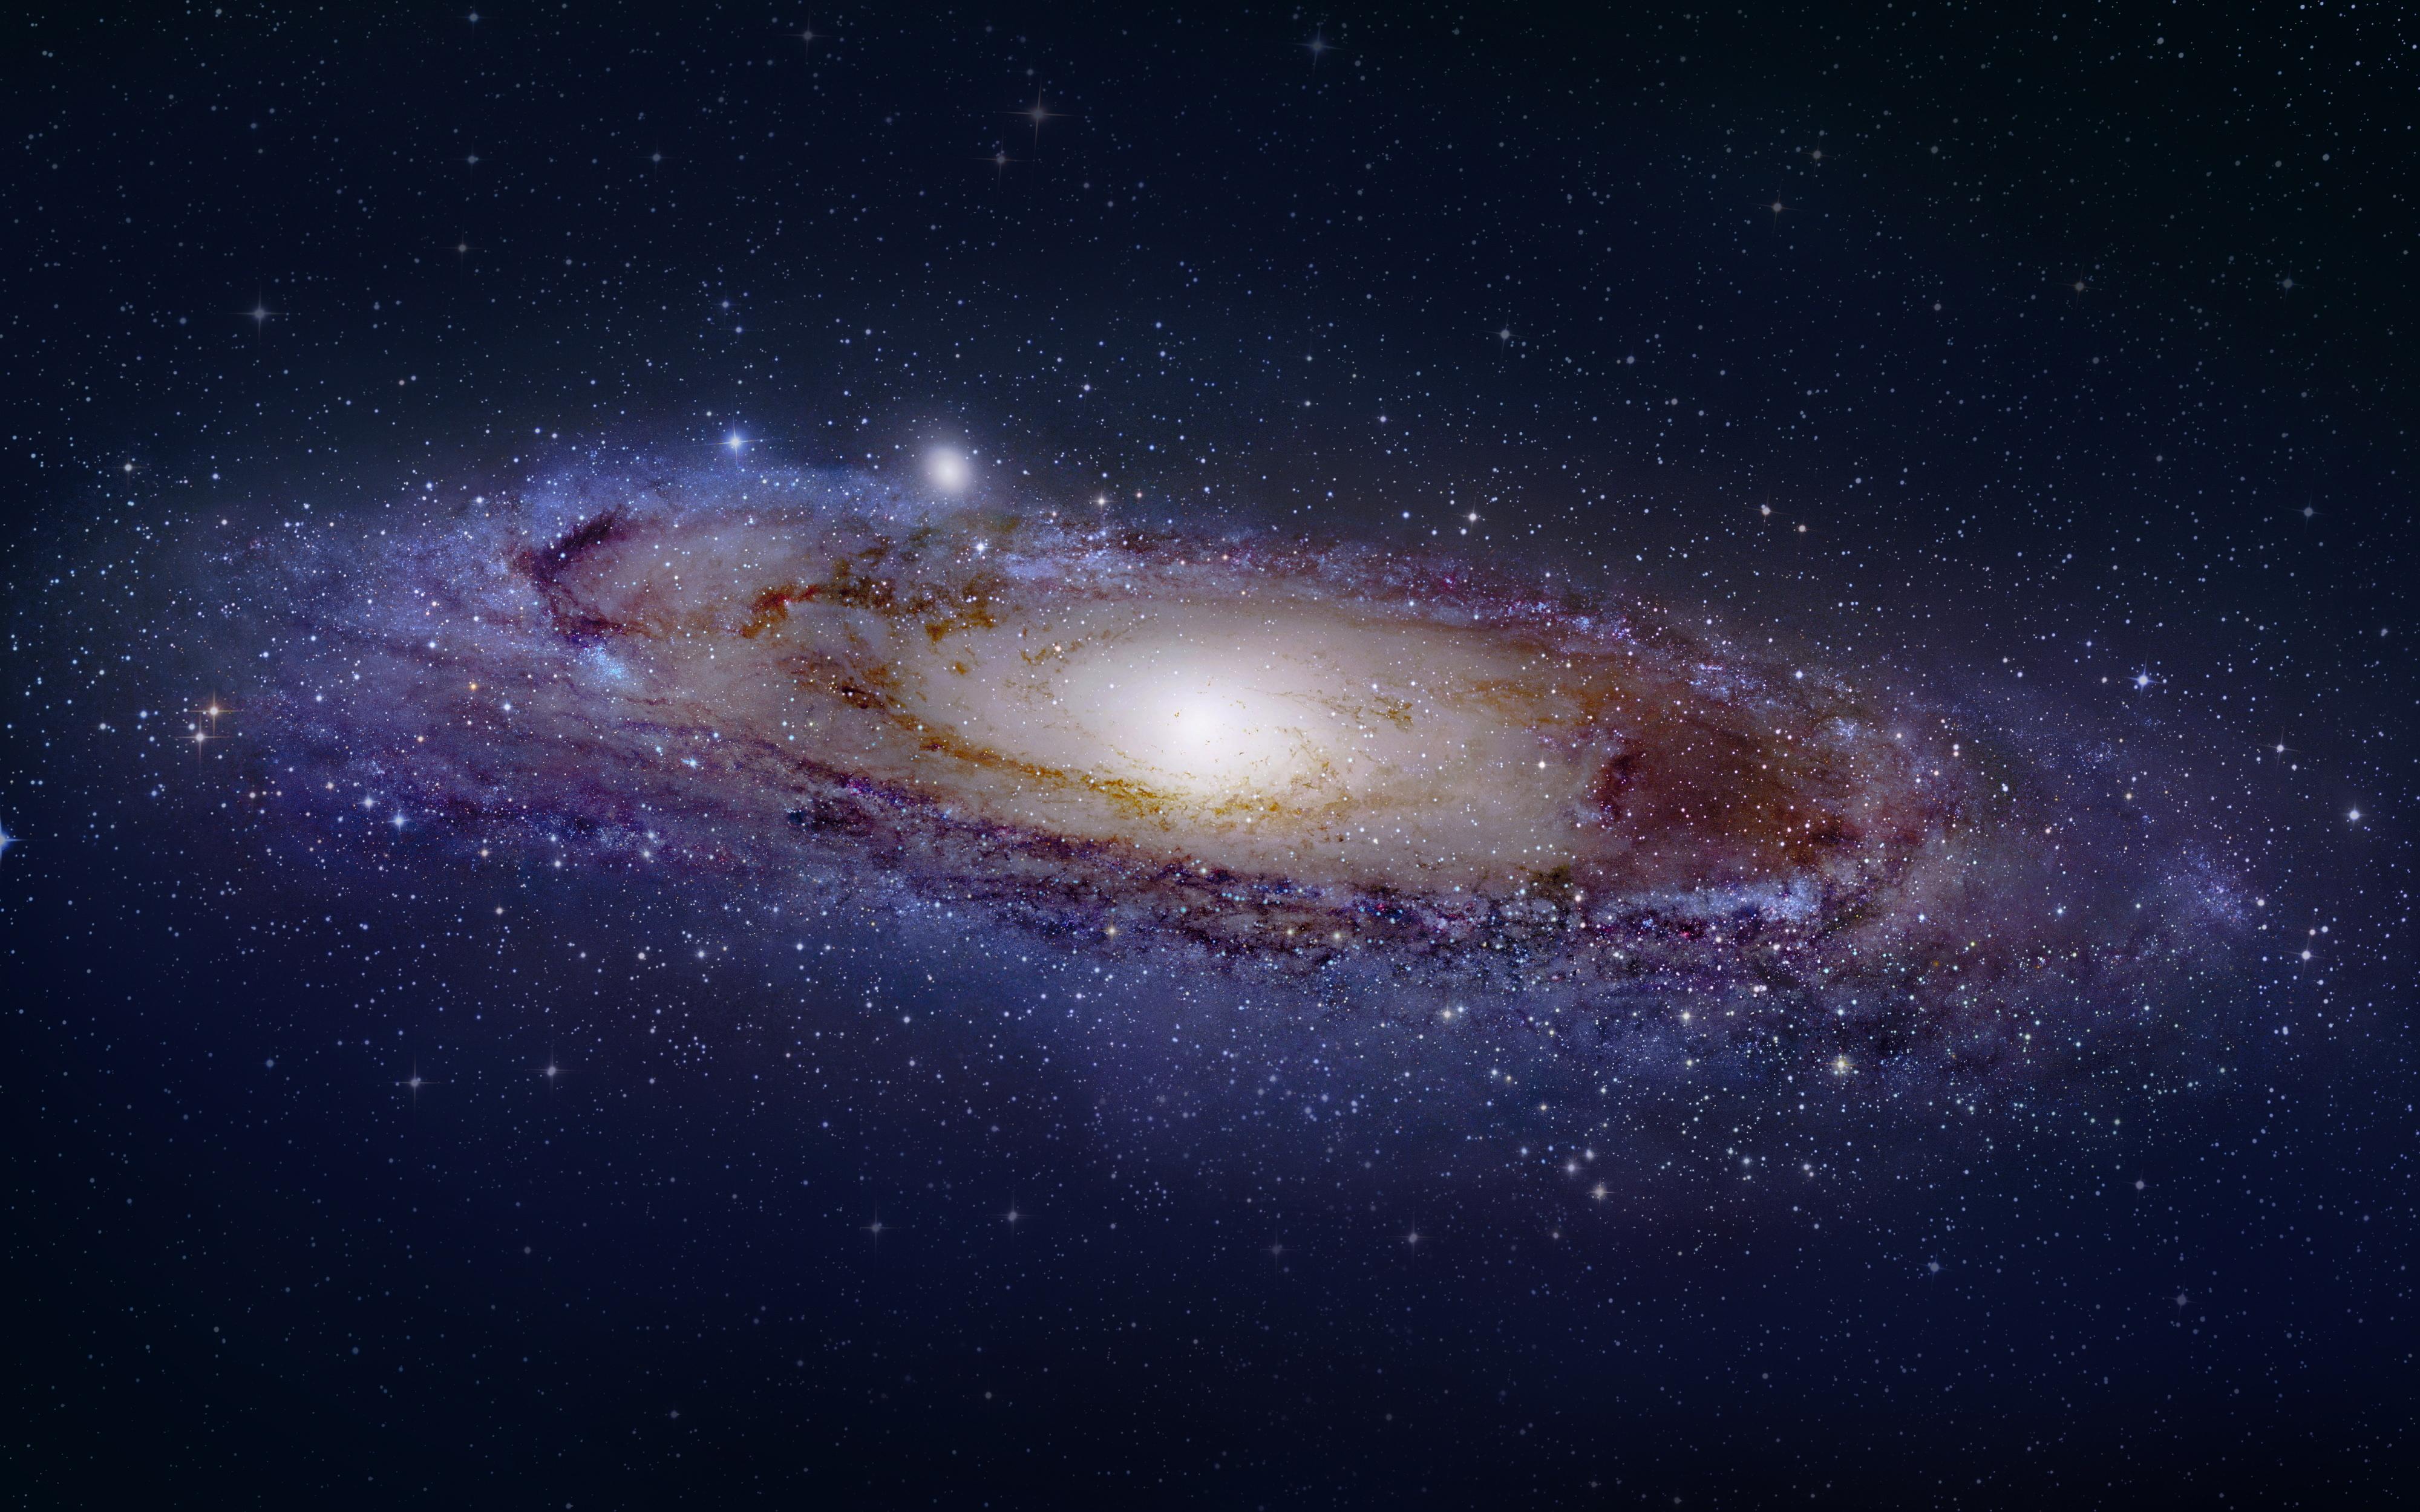 galaxy-wallpaper-background-HD_07